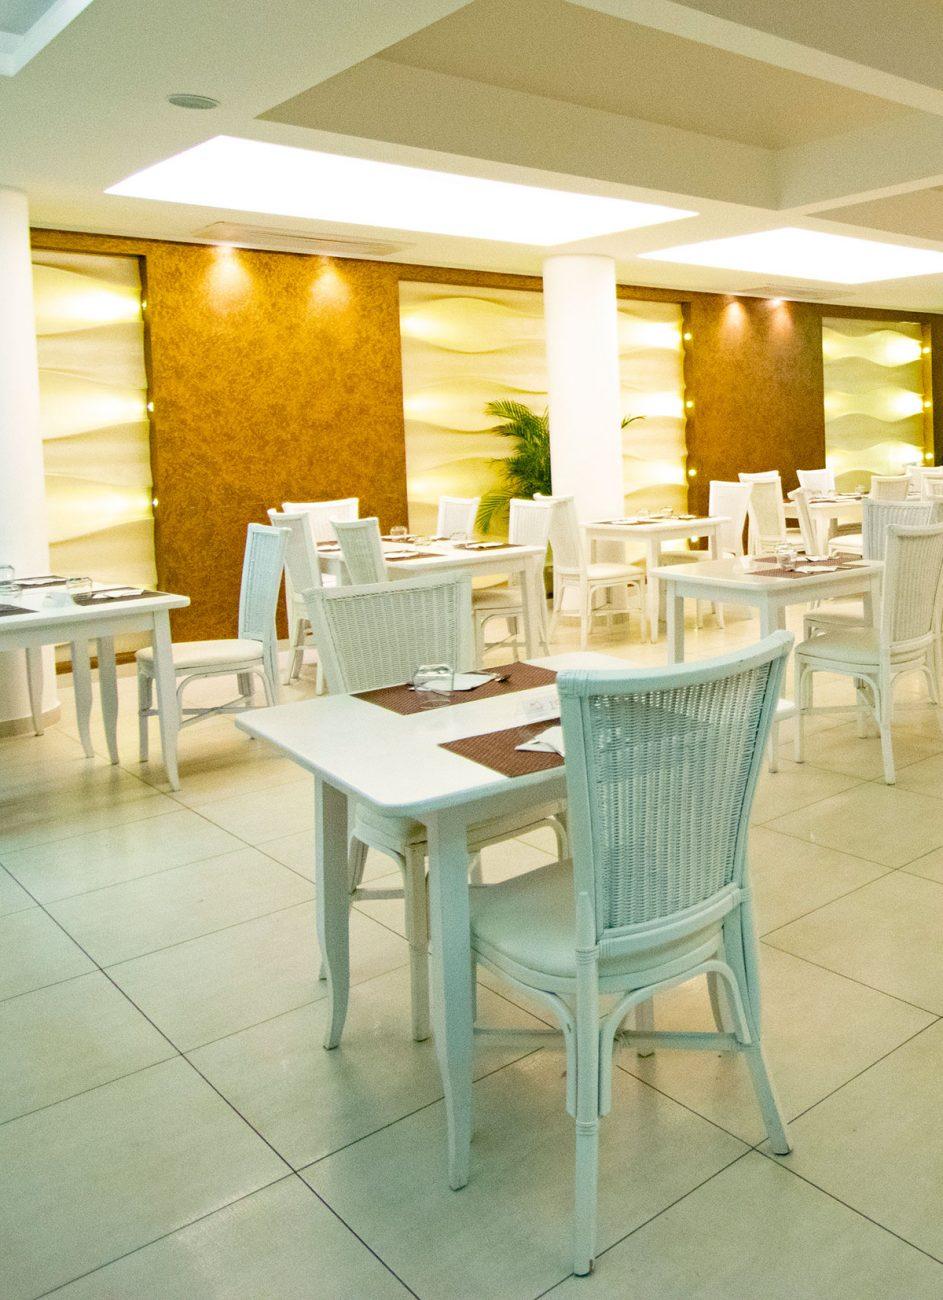 new-ristorante3-hi